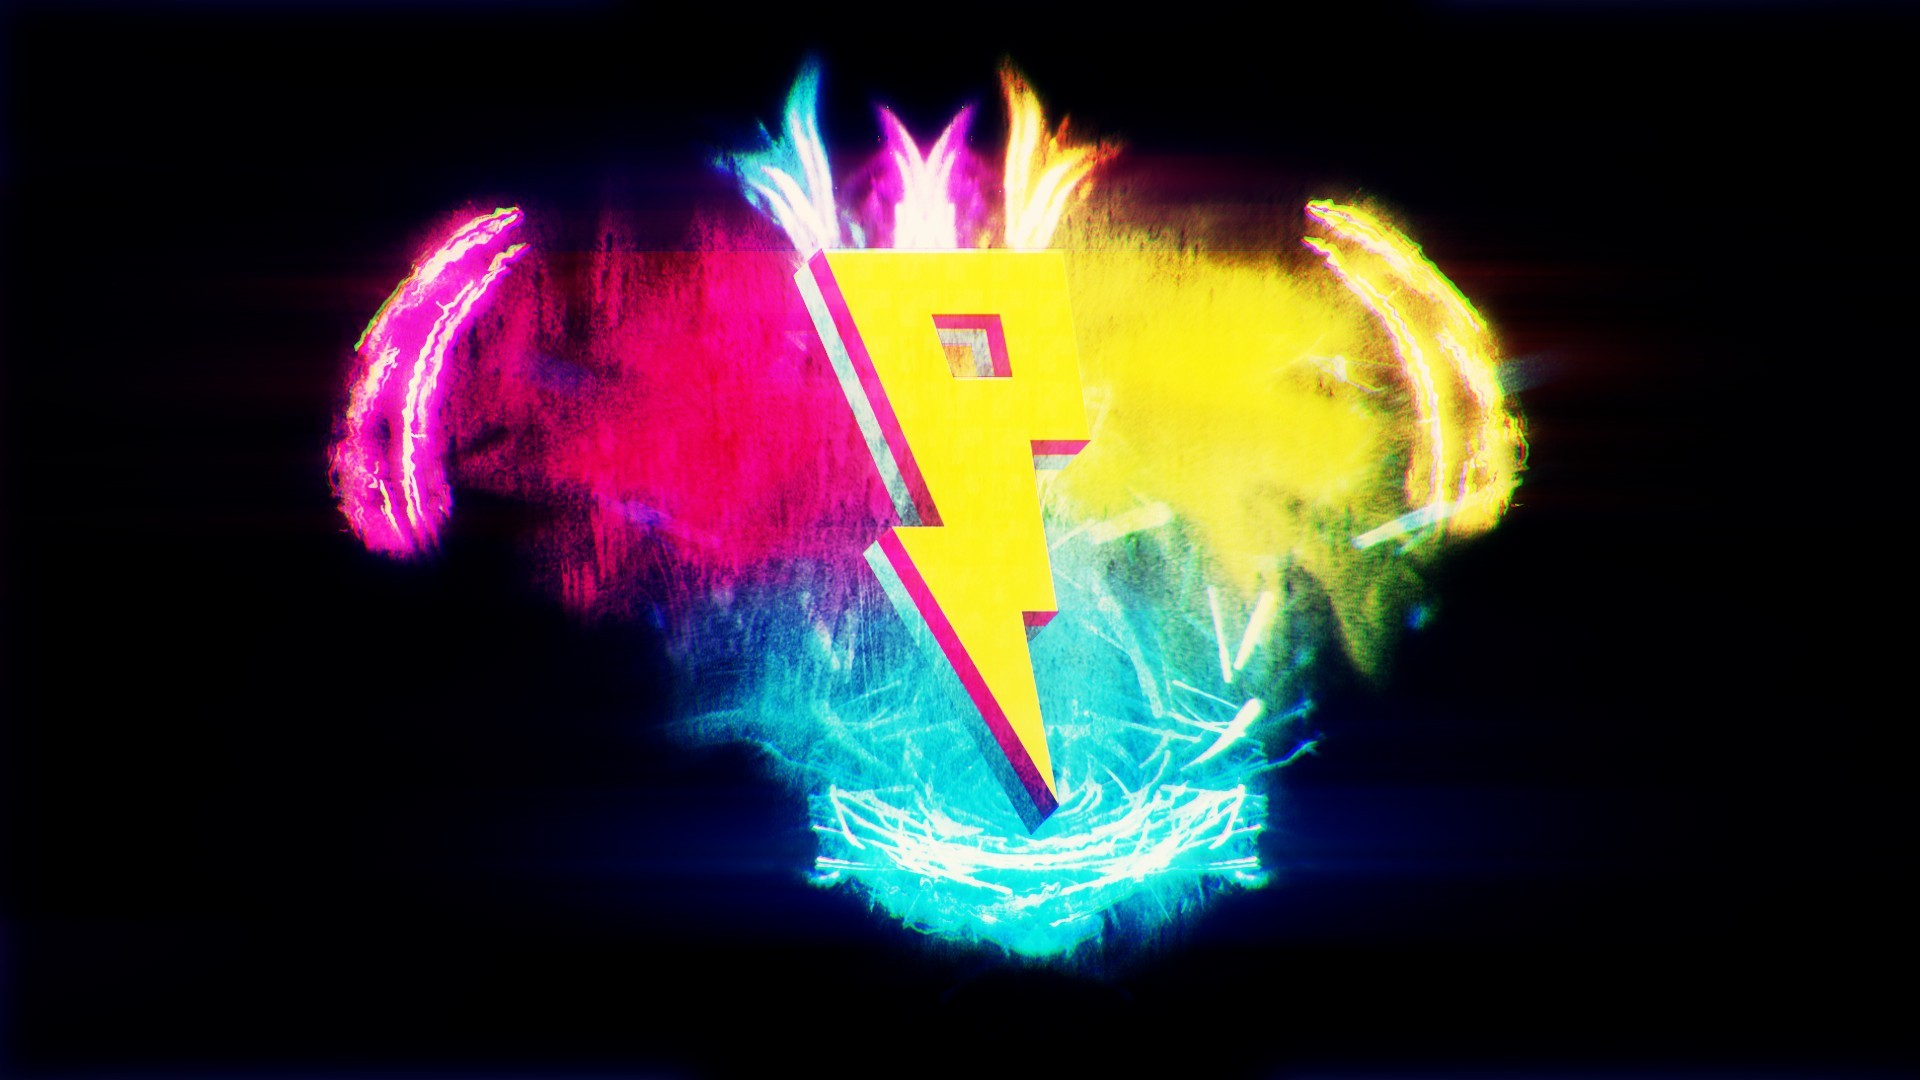 Logo Colorful Simple Background Digital Art 1920x1080